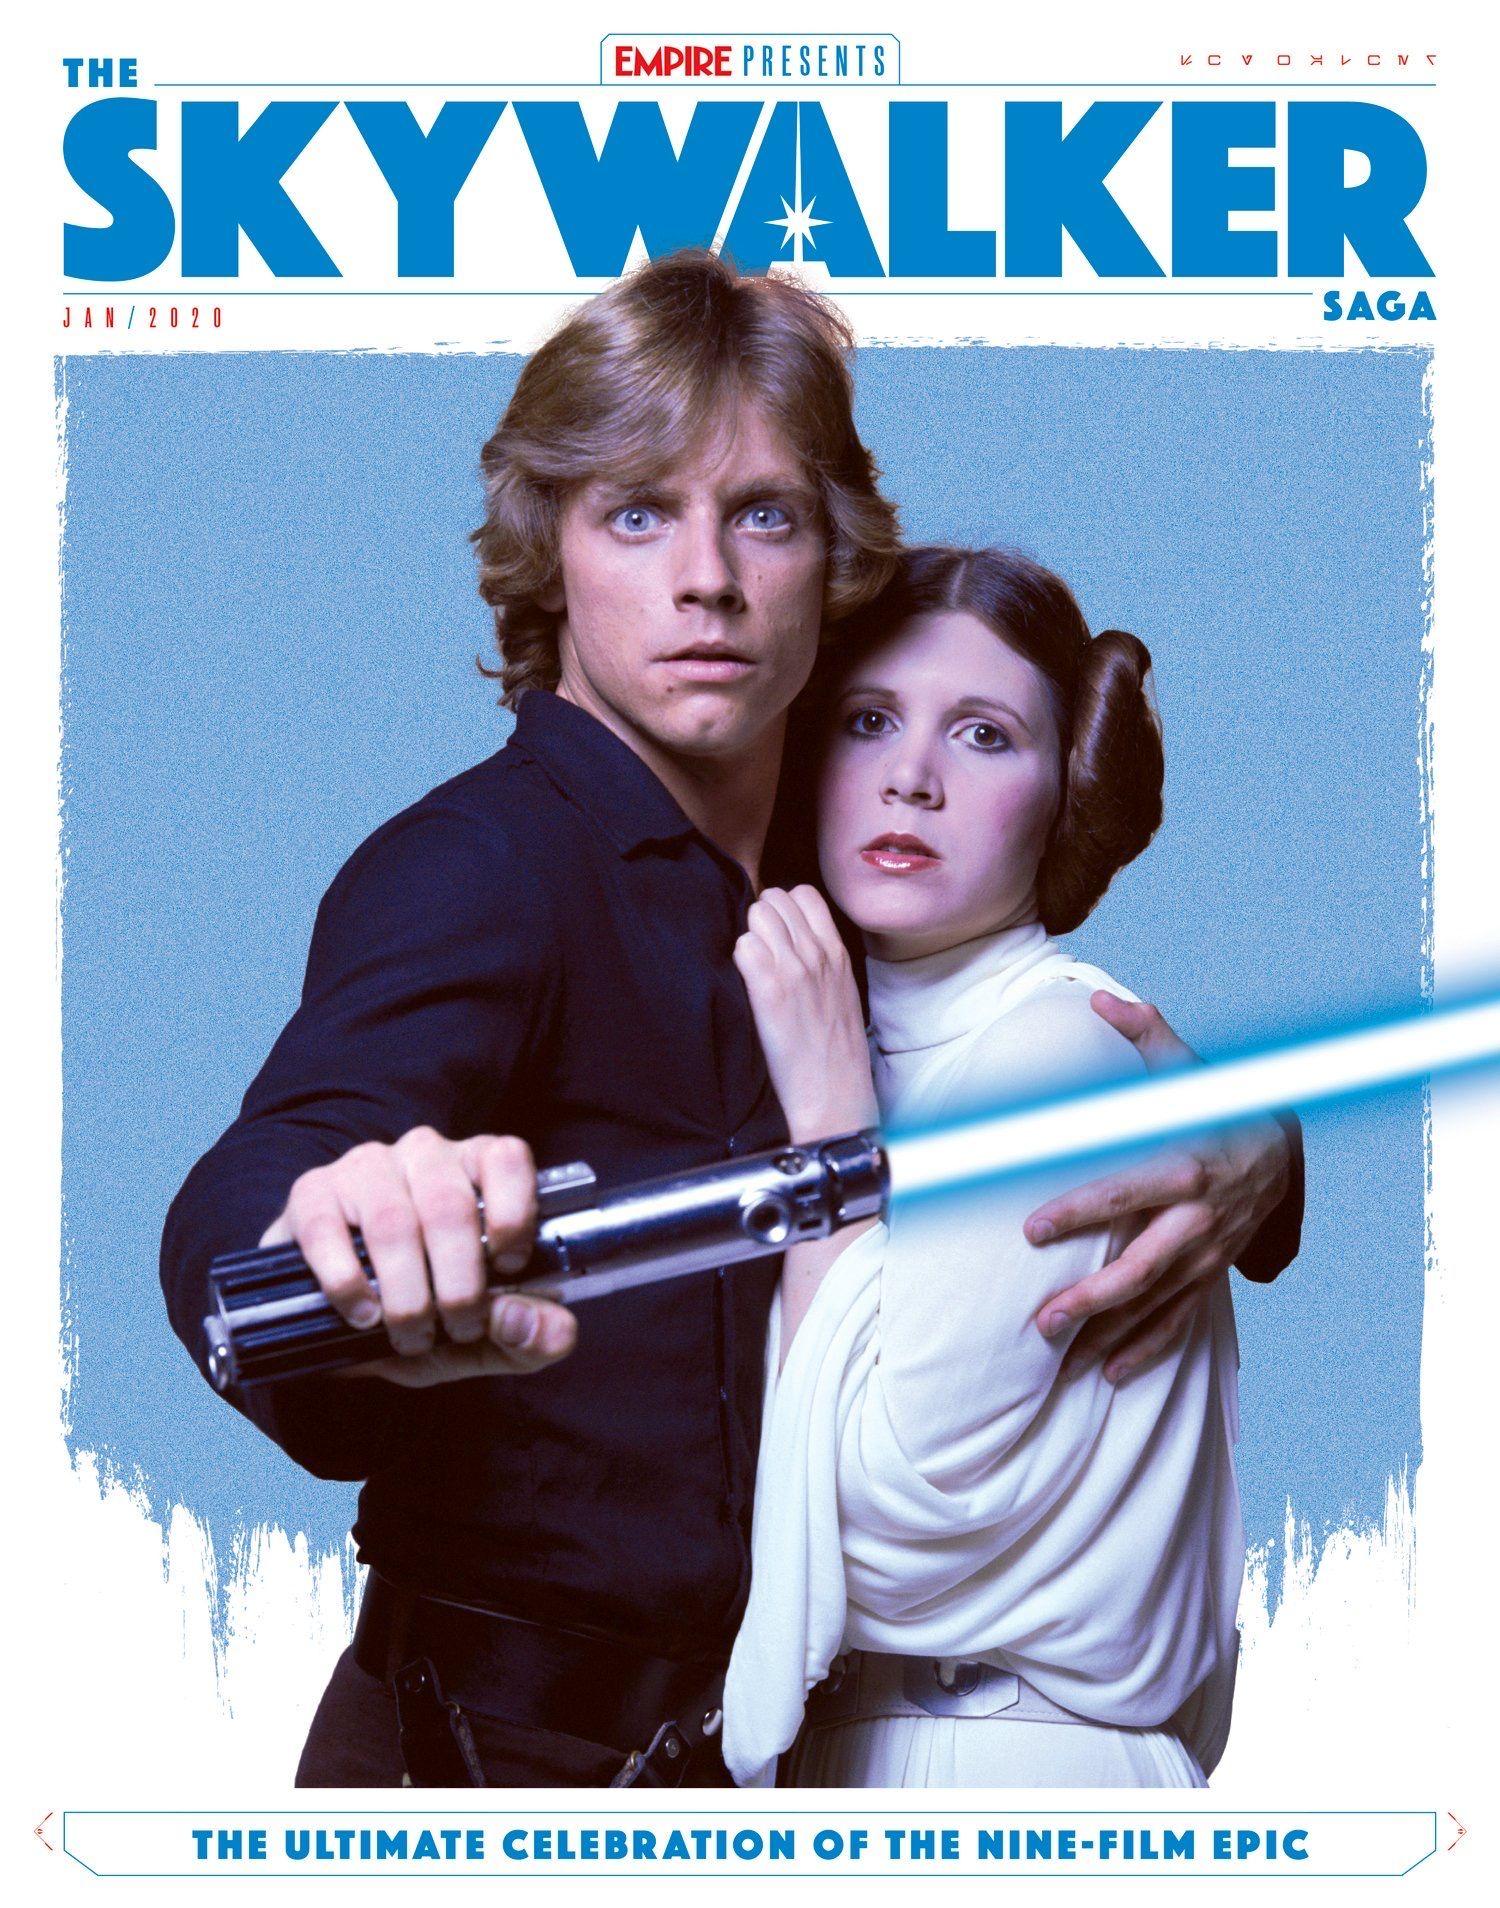 Star Wars Star Wars Poster Rey Star Wars Star Wars